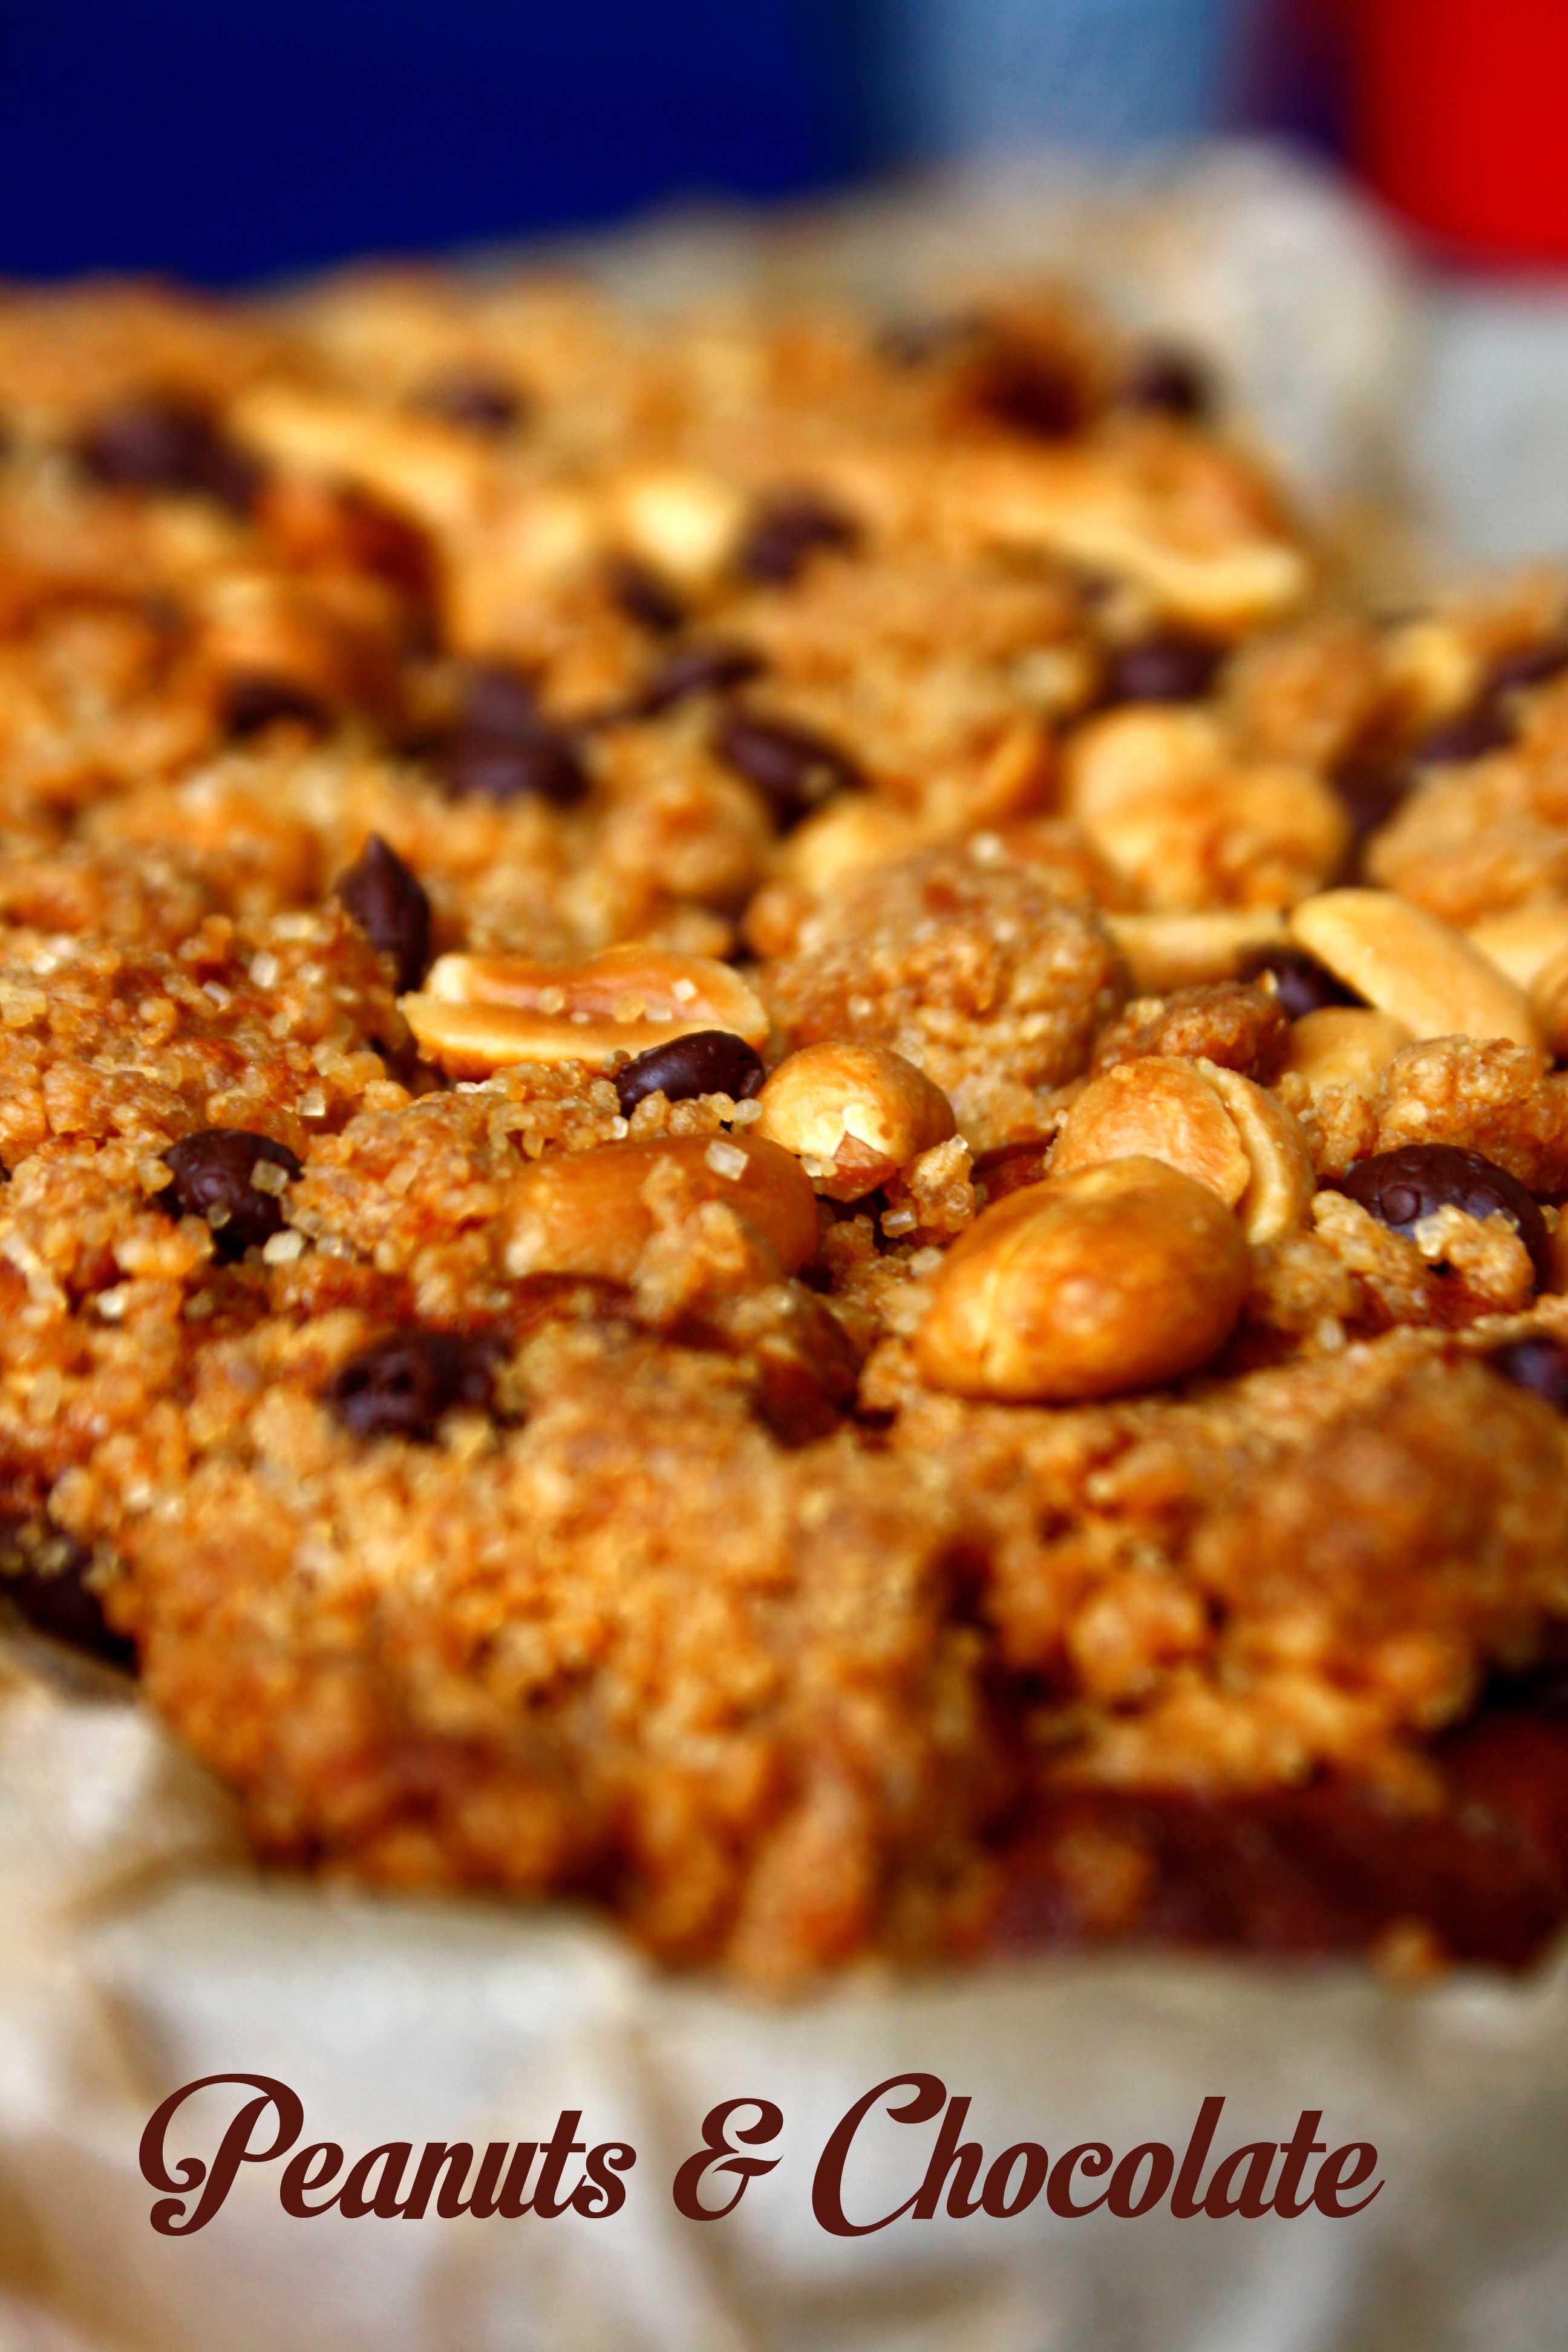 Erdnuss Schoko Streusel Kuchen // Peanut Chocolate Crumble Cake by http://babyrockmyday.com/erdnuss-schoko-streusel-kuchen/